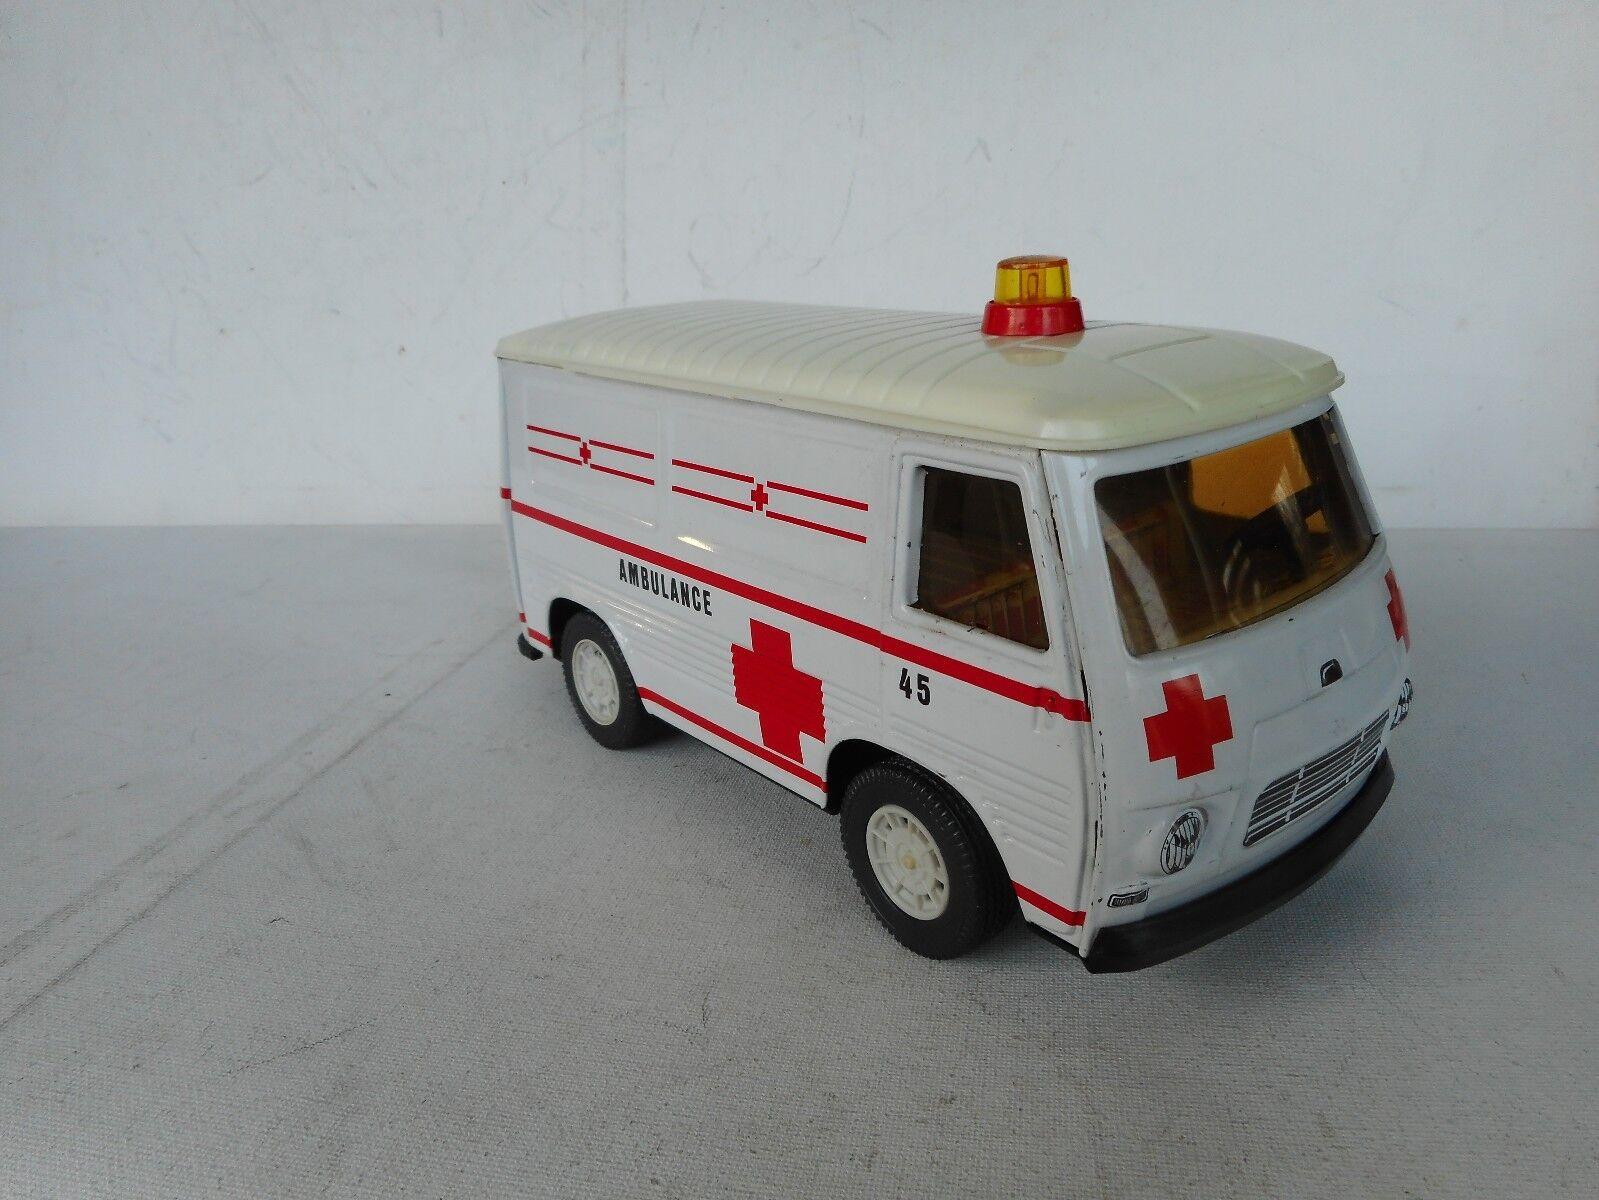 Joustra Peugeot J7  Ambulance Ambulance Ambulance 70er Jahre Blech Spielzeug France Tin Toy RARE   310eaf